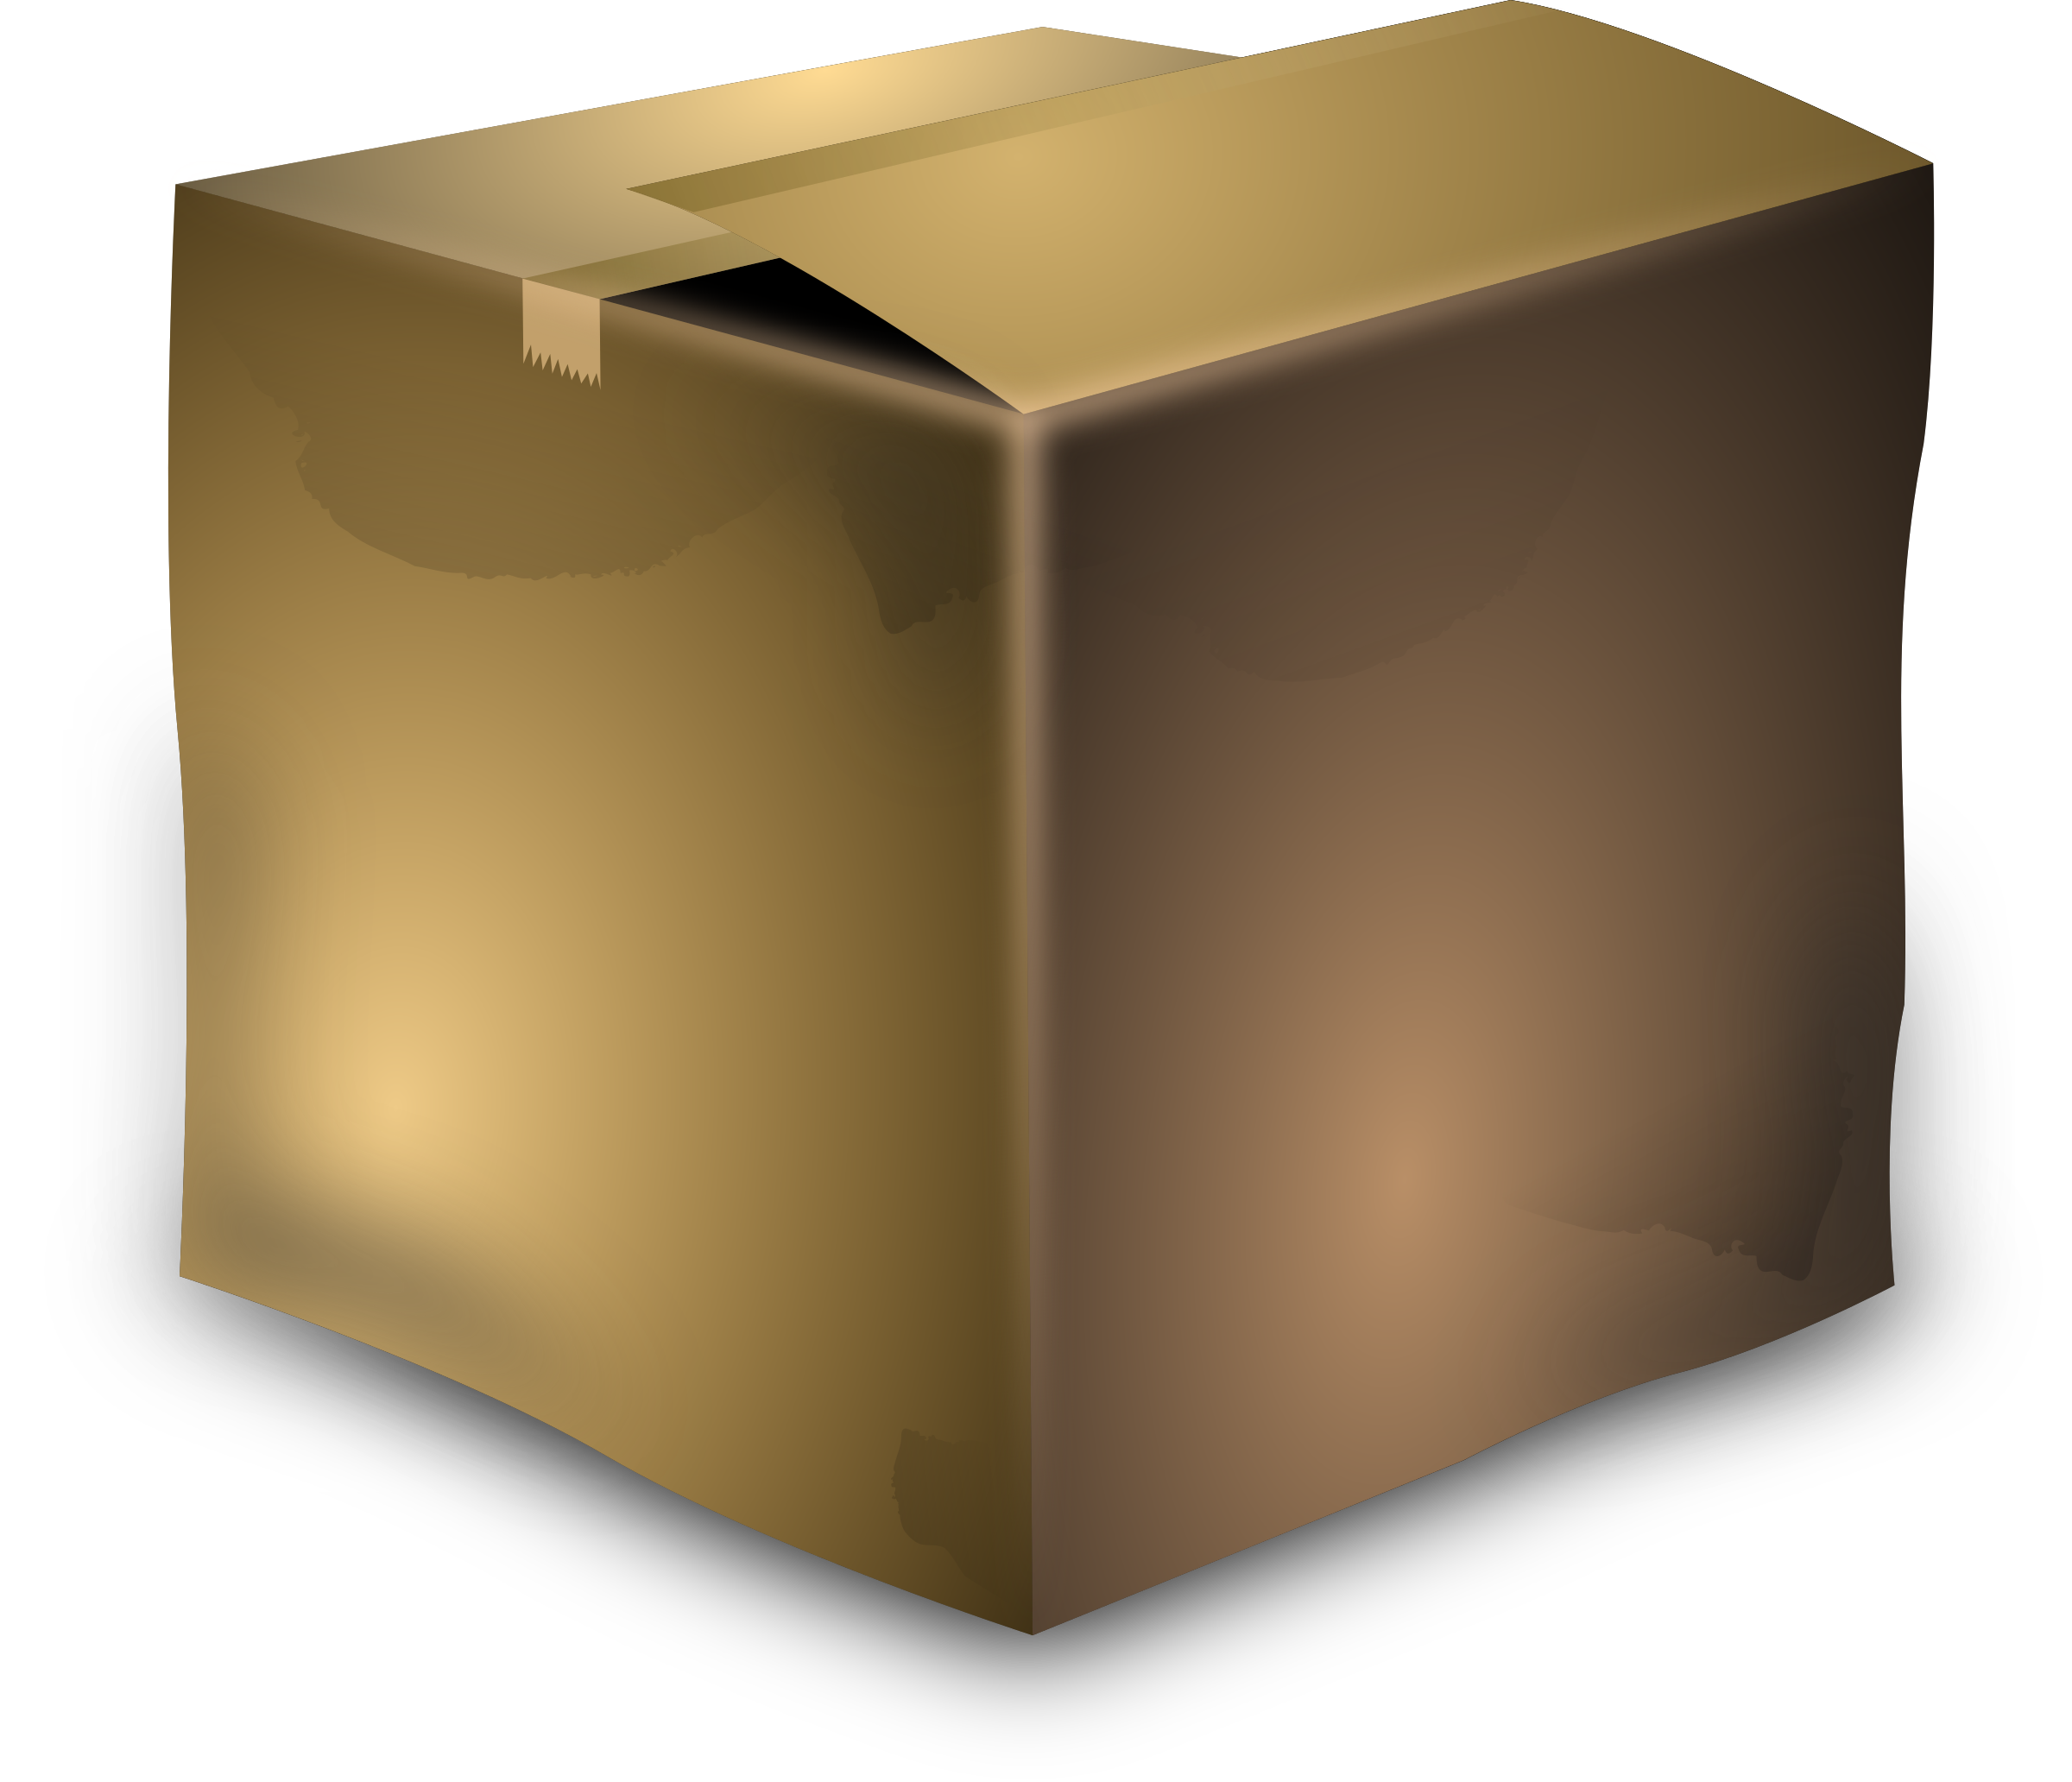 Wallet clipart brown. Cardboard box big image